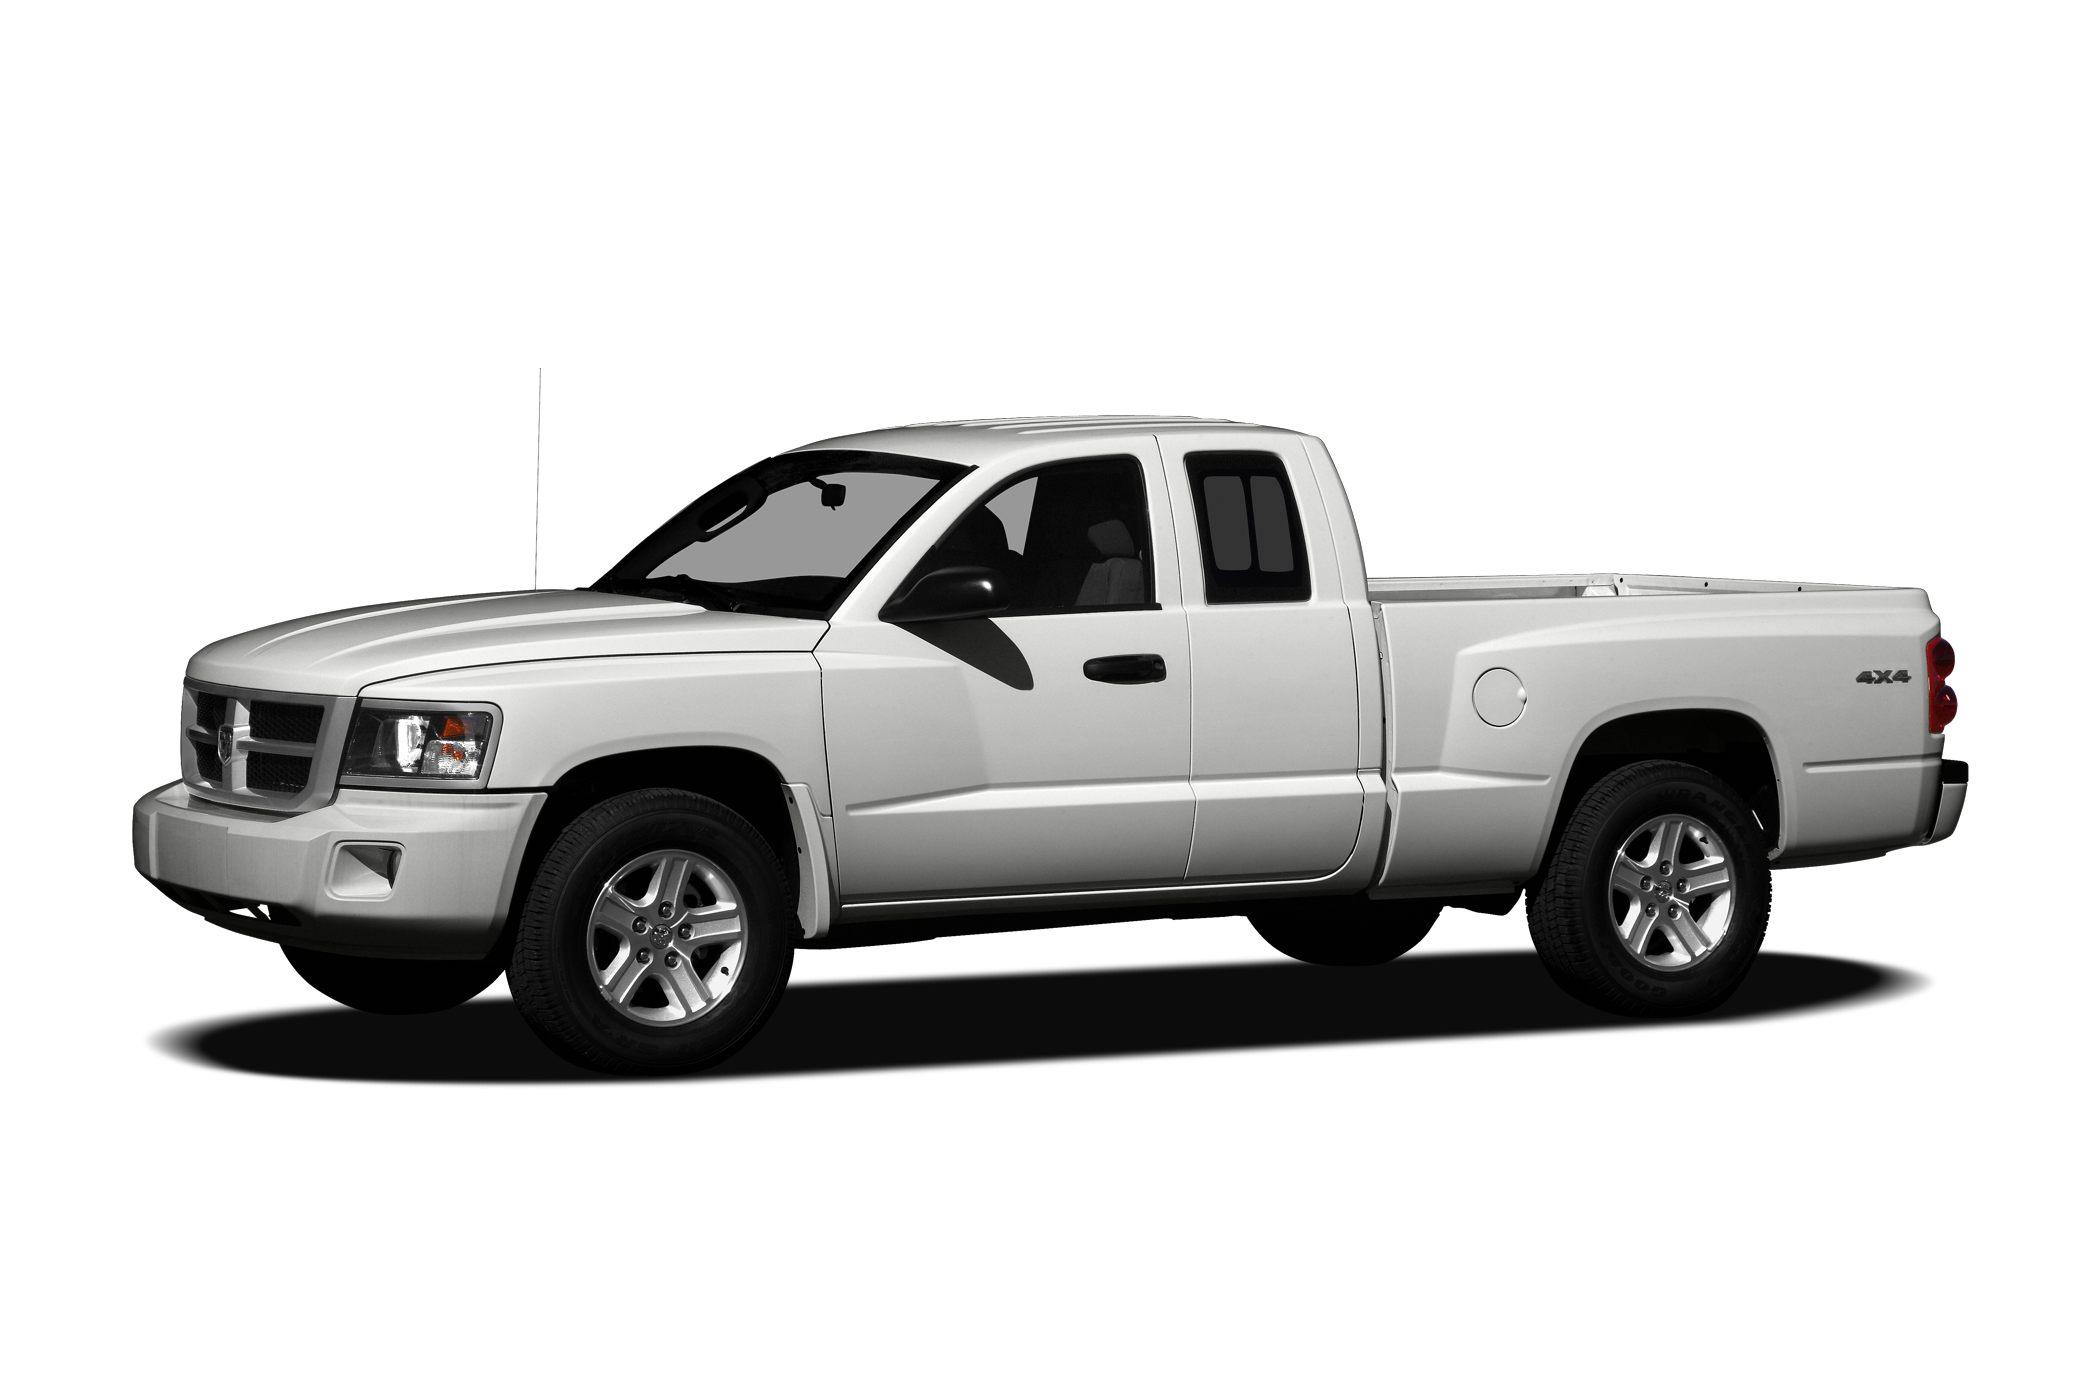 2010 Dodge Dakota ST Vehicle Options 4WDAWD Driver Airbag Steel Wheels ABS Brakes Fog Lights Tach